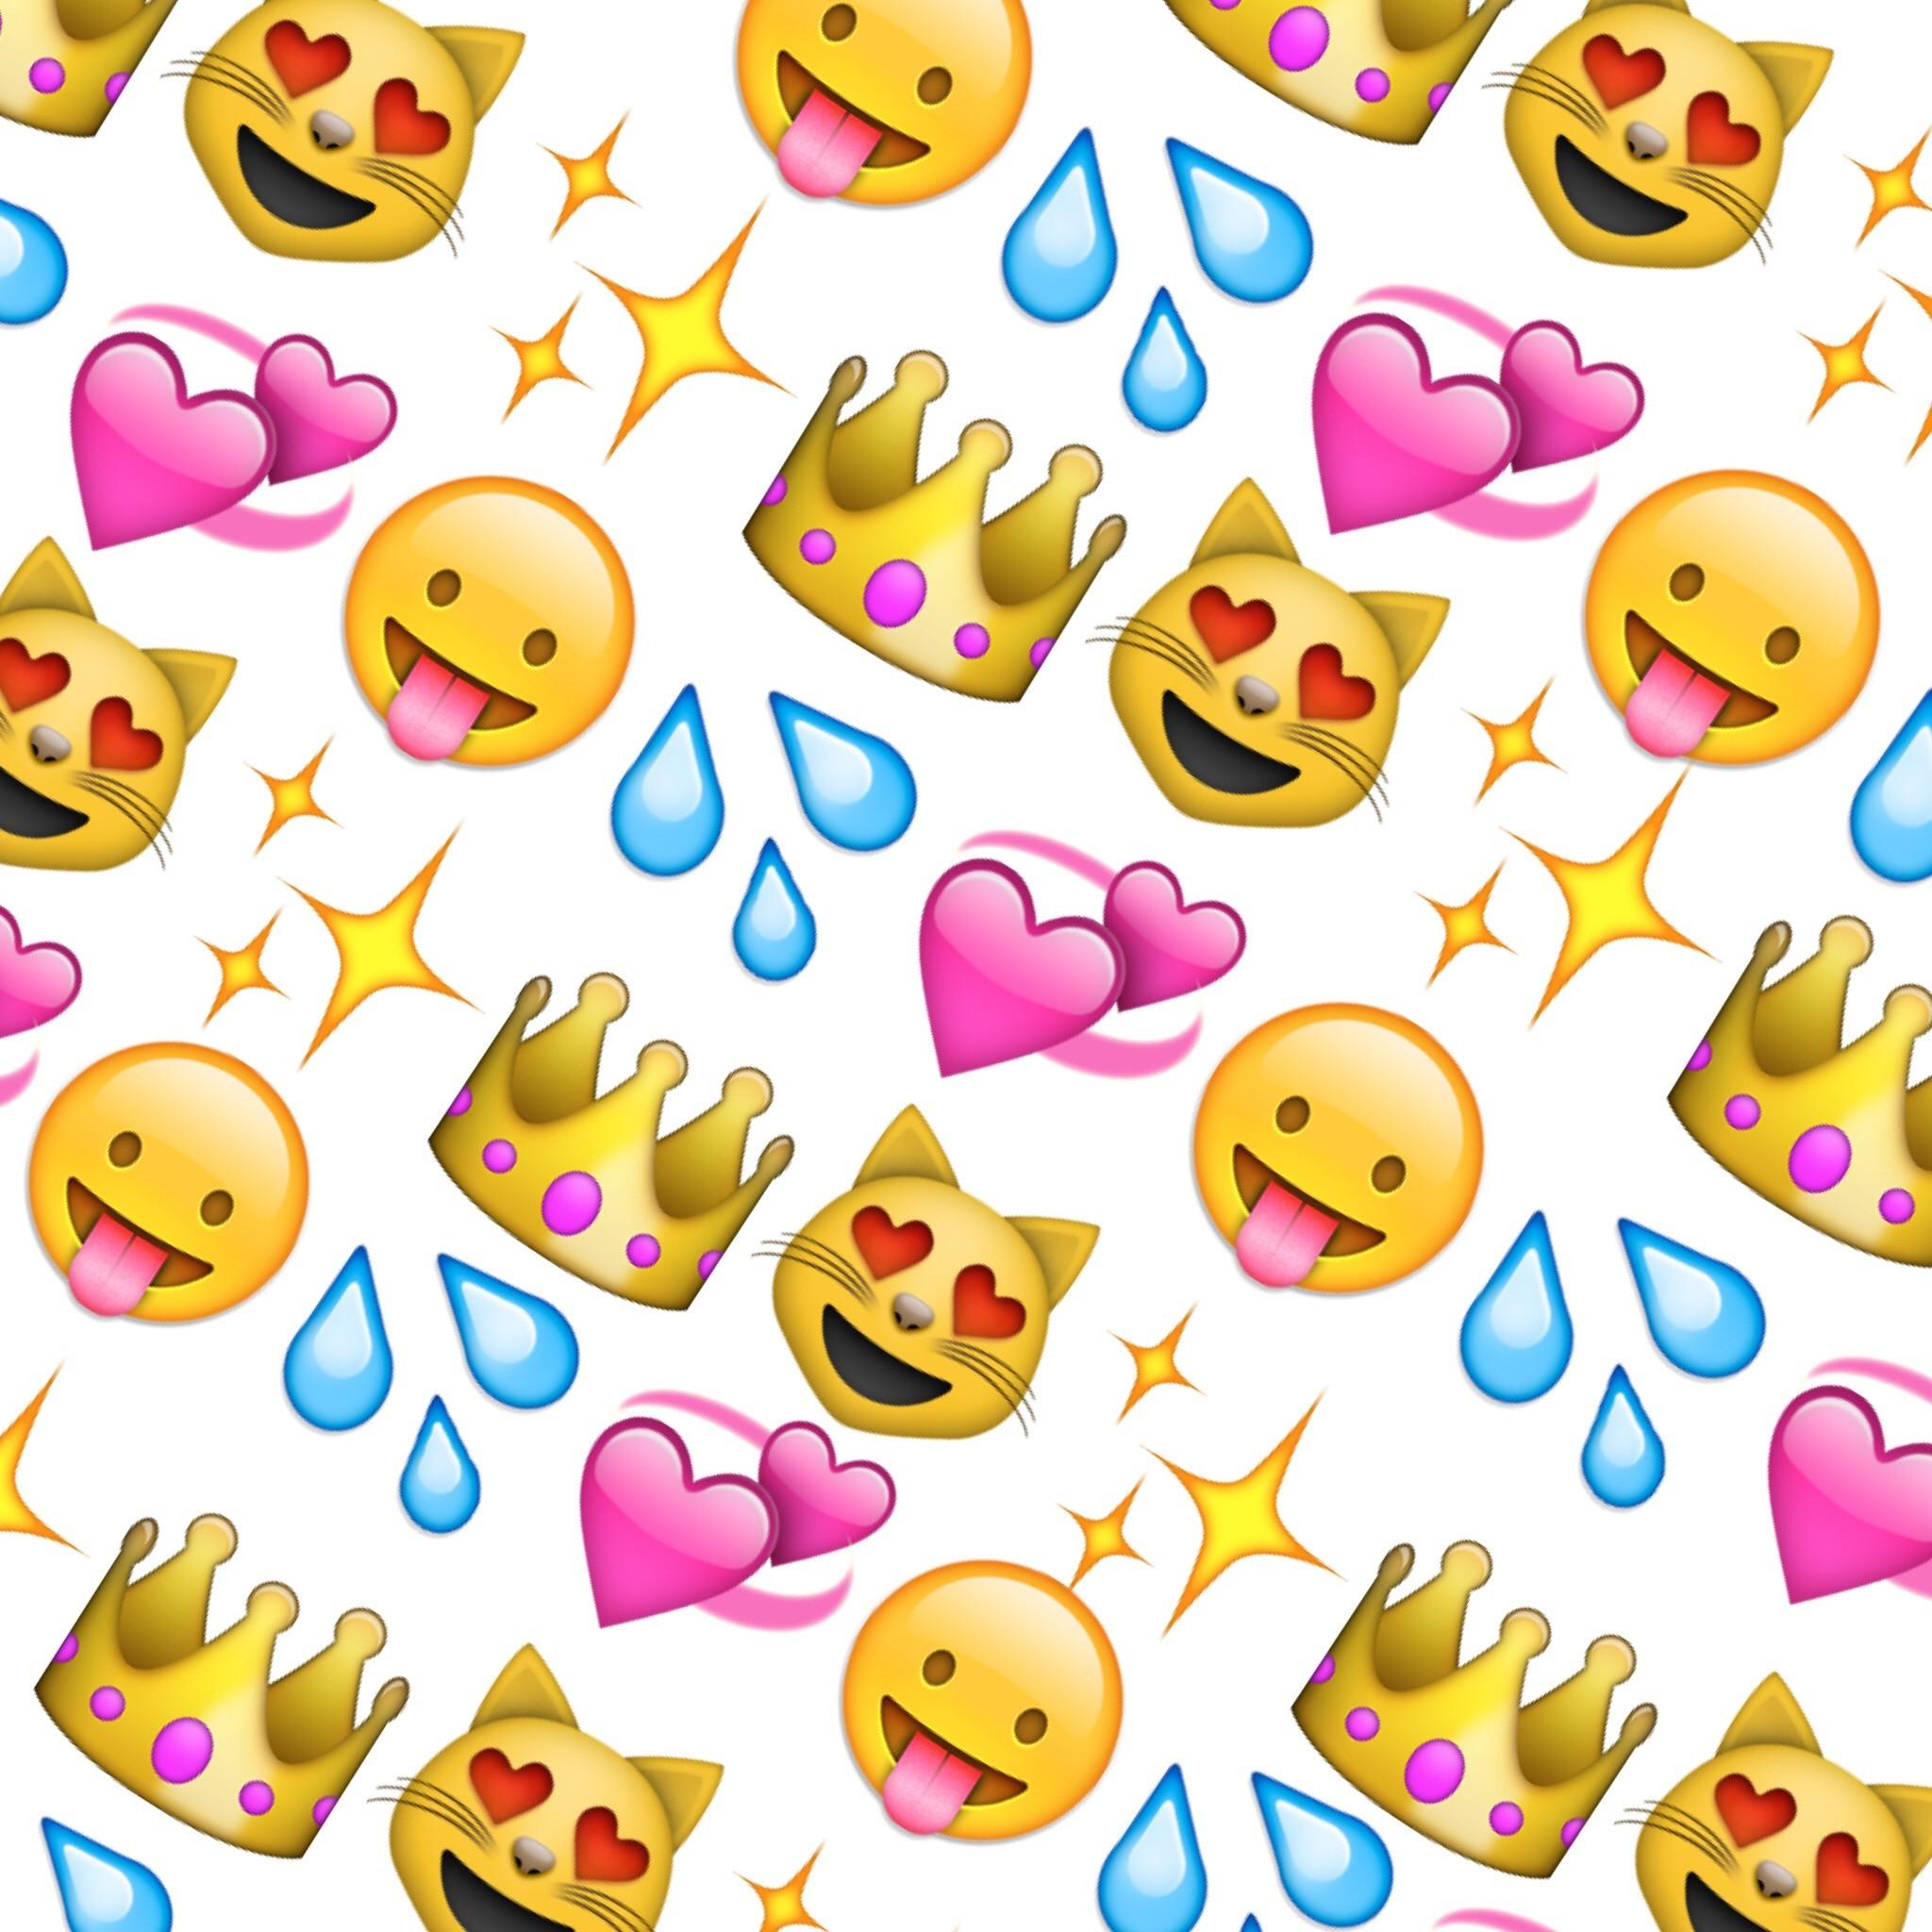 100 Emoji Wallpaper (48+ images)